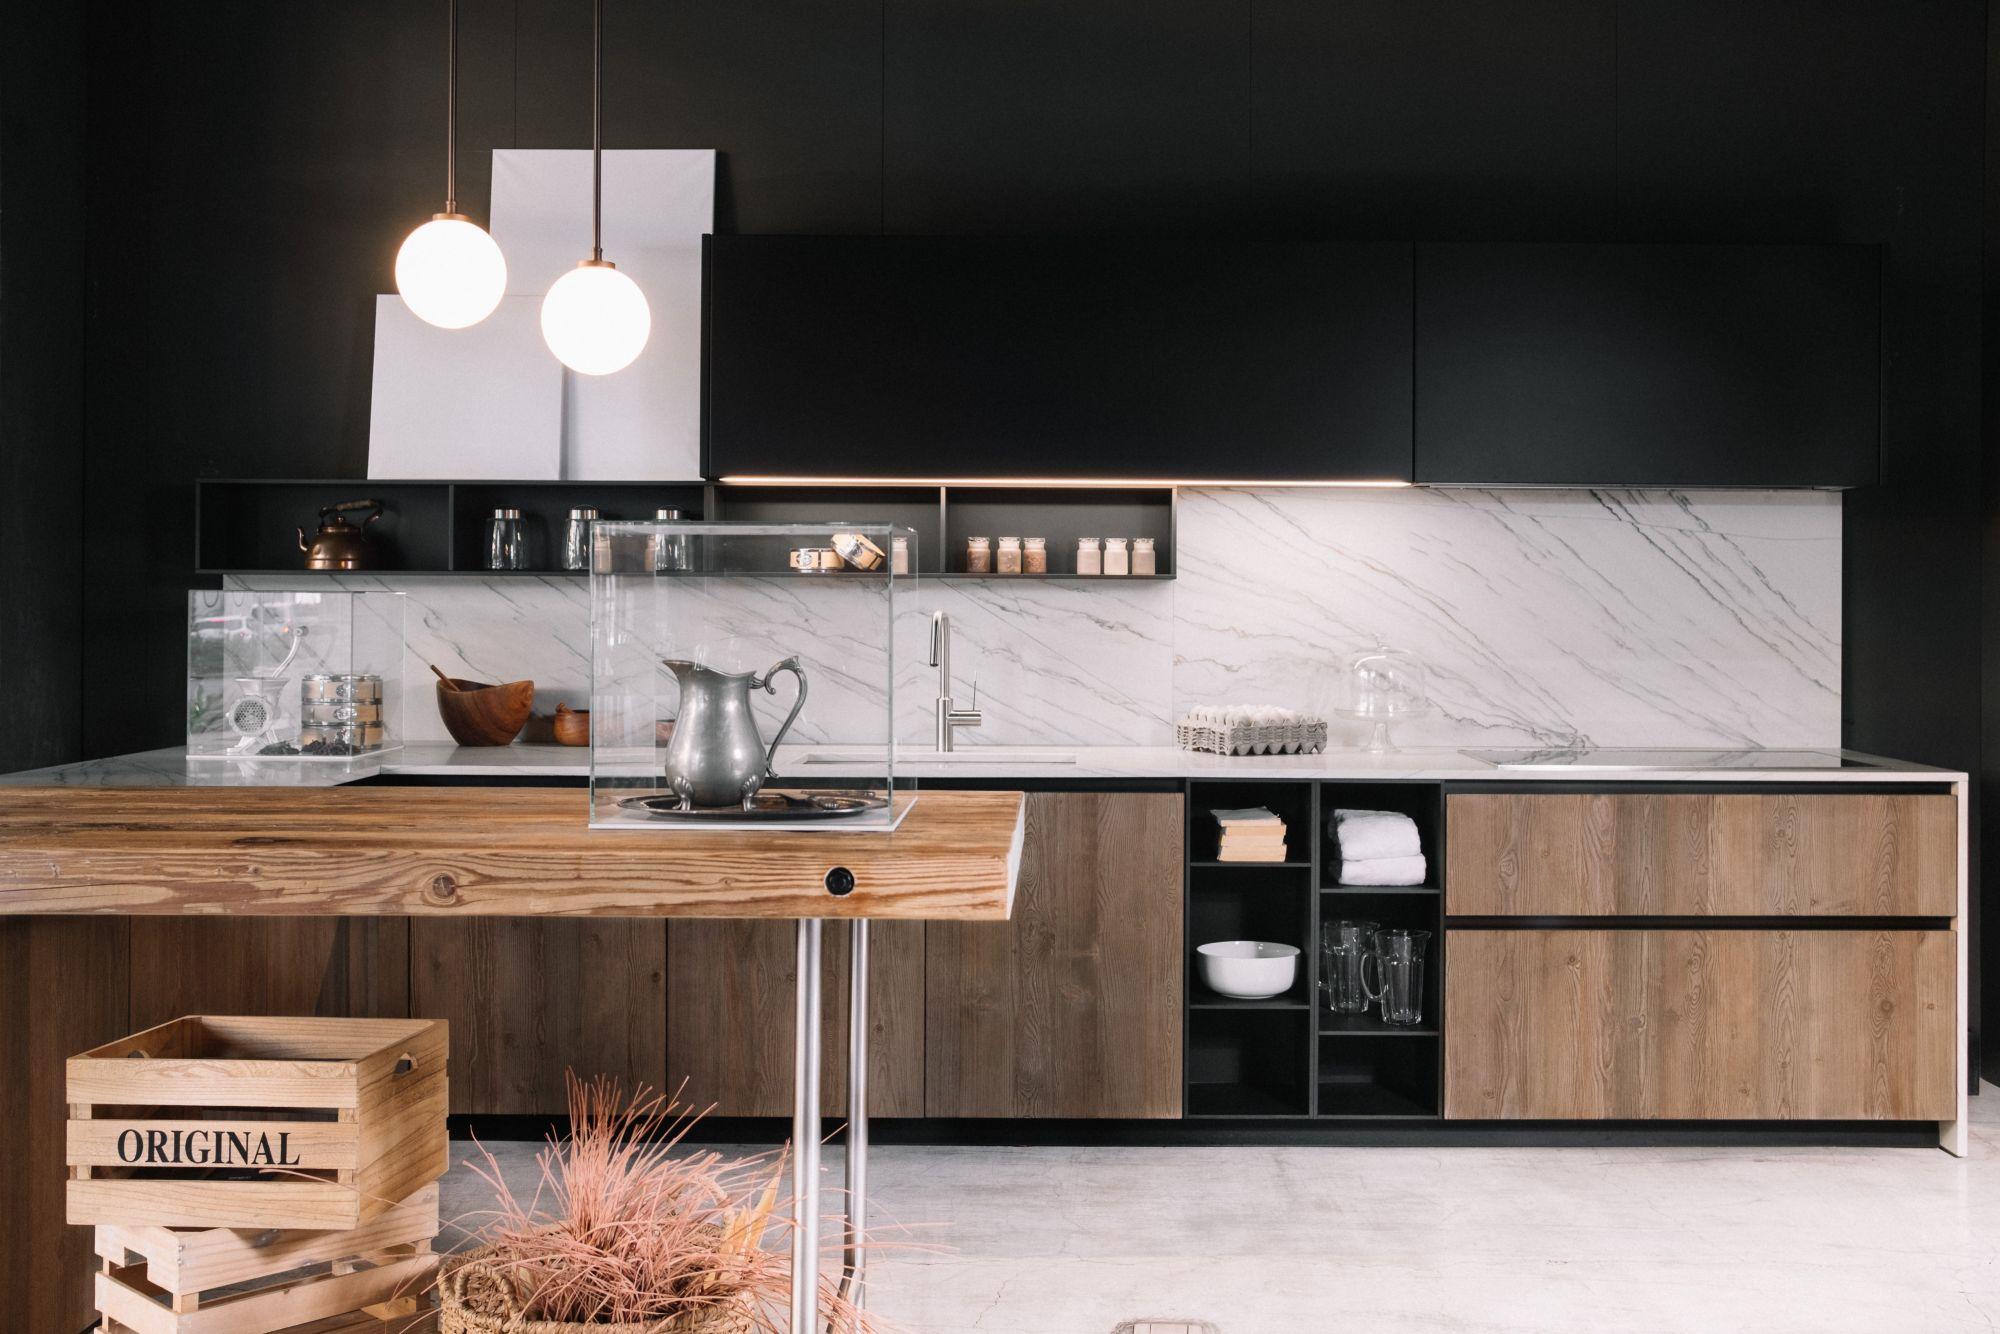 Boffi Studio Manila Provides A Modern And Innovative Home Design